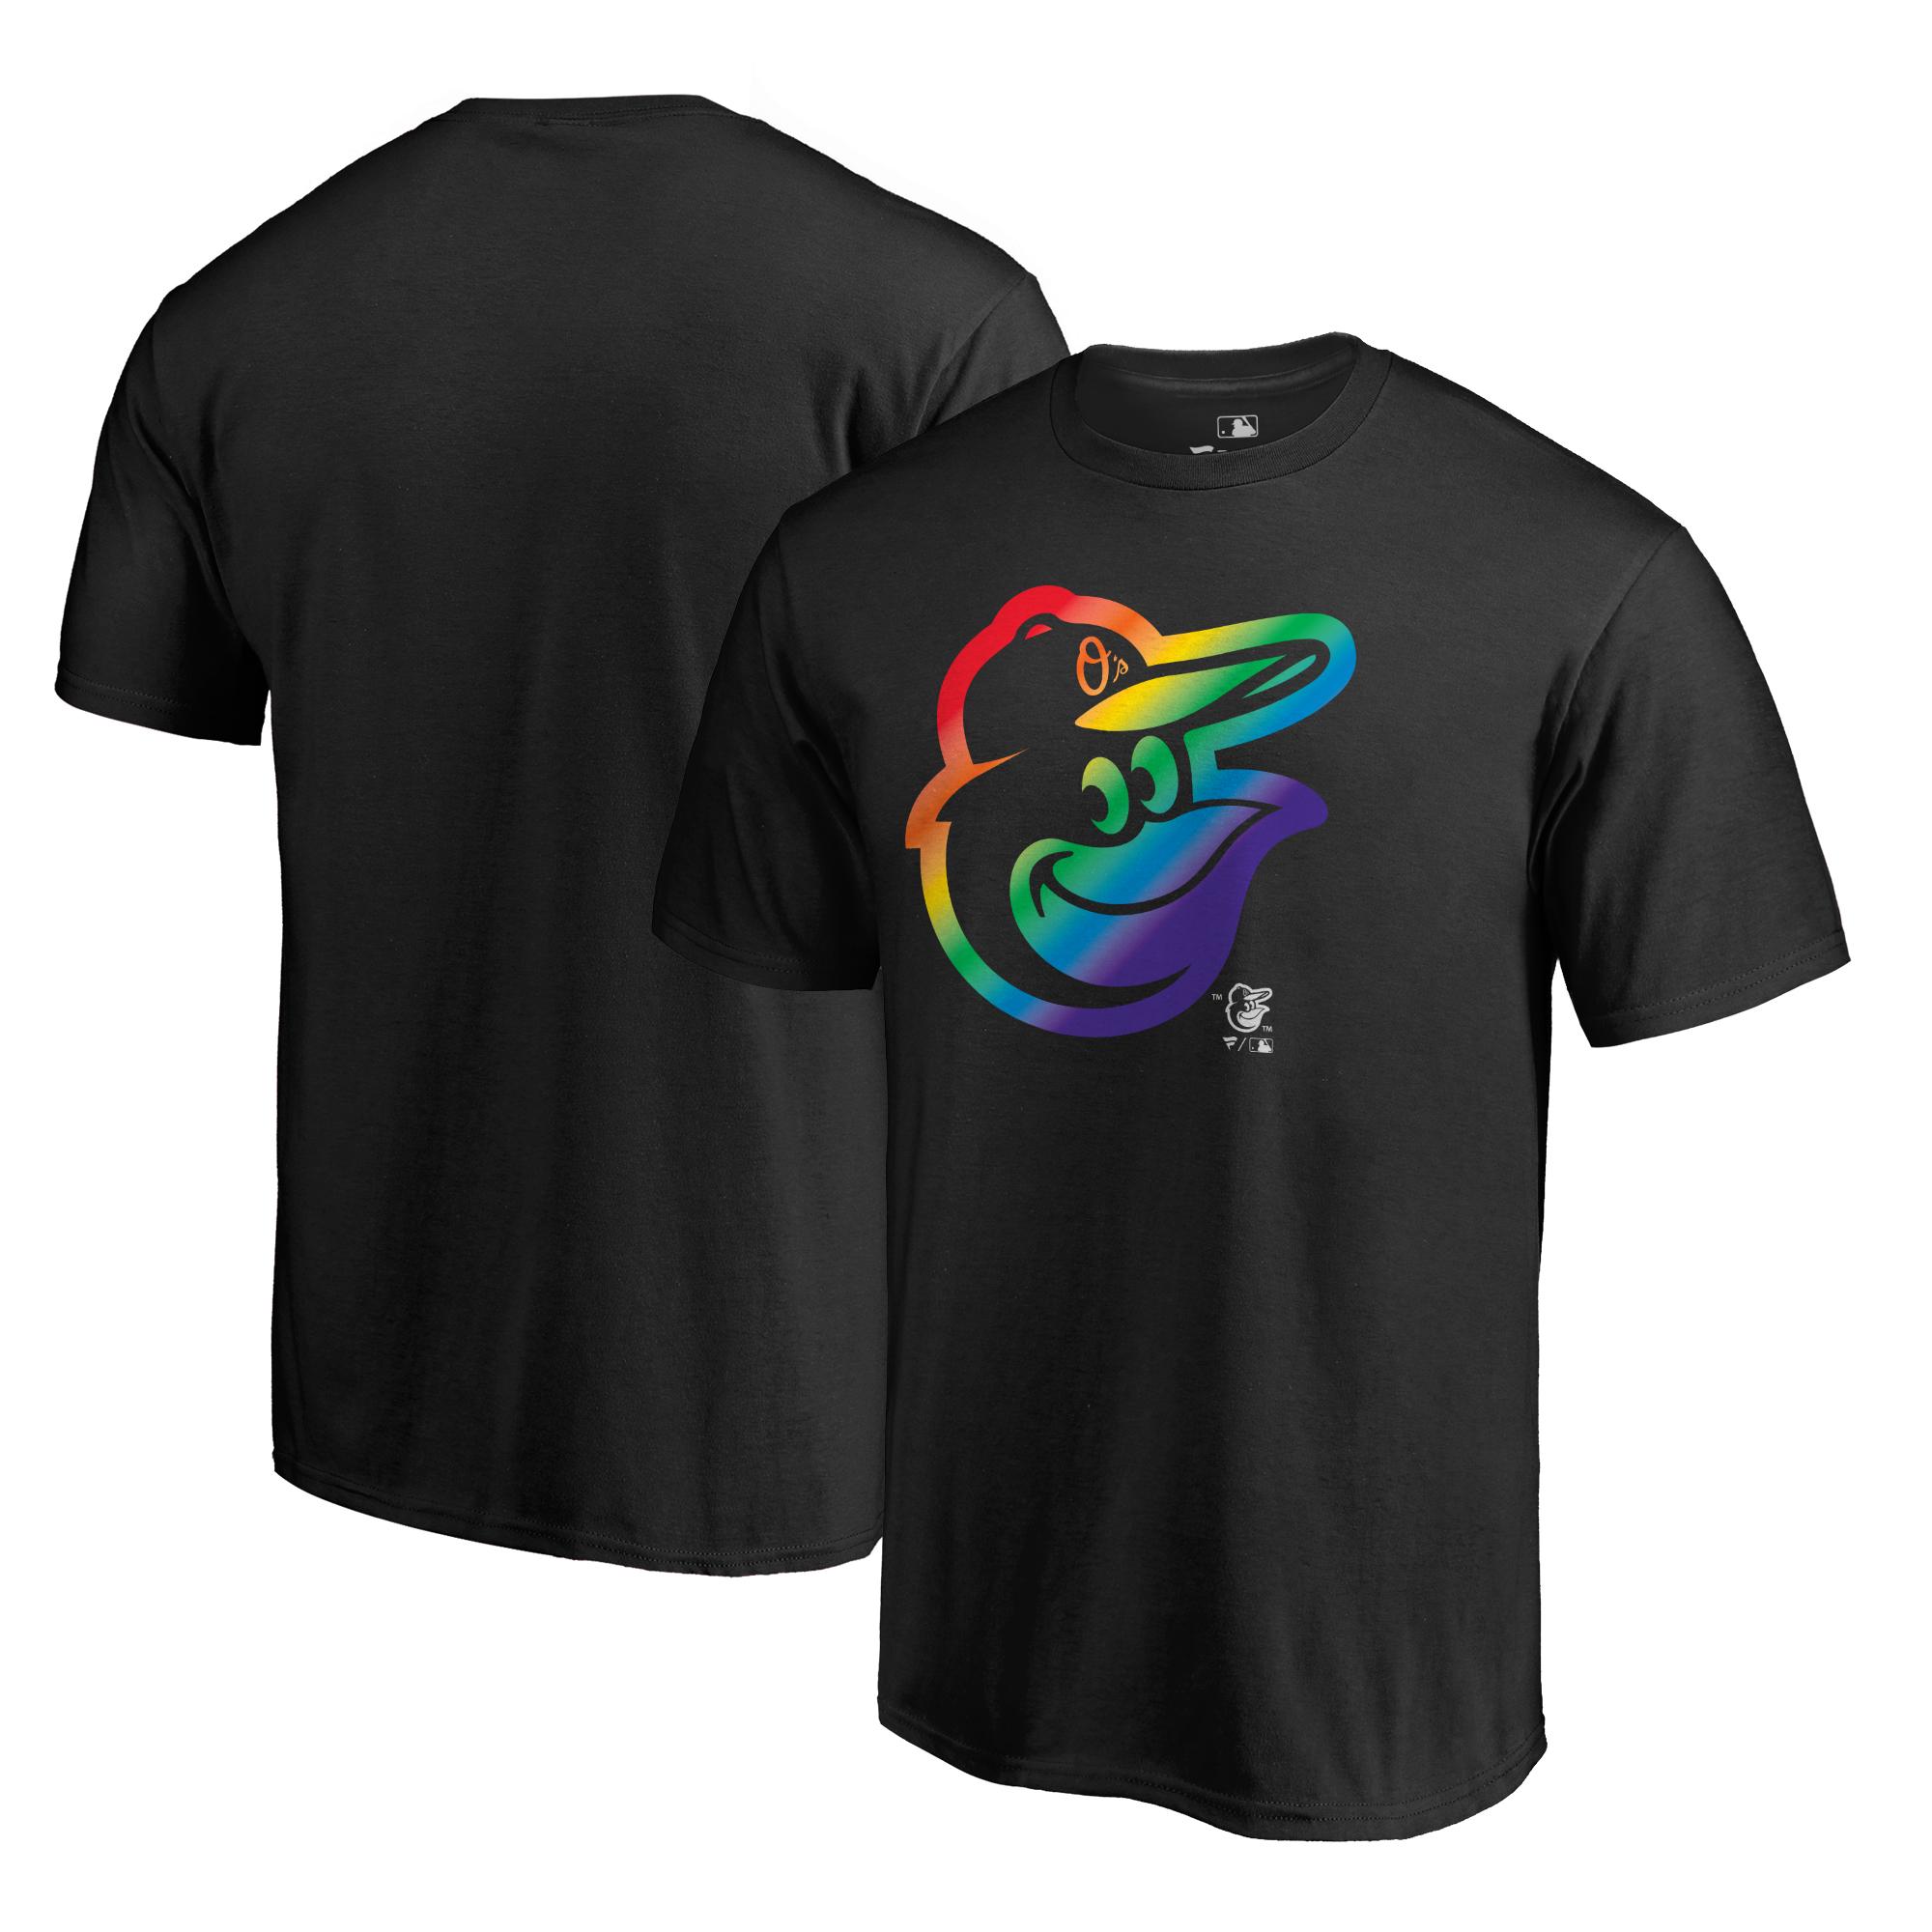 Baltimore Orioles Fanatics Branded Pride T-Shirt - Black